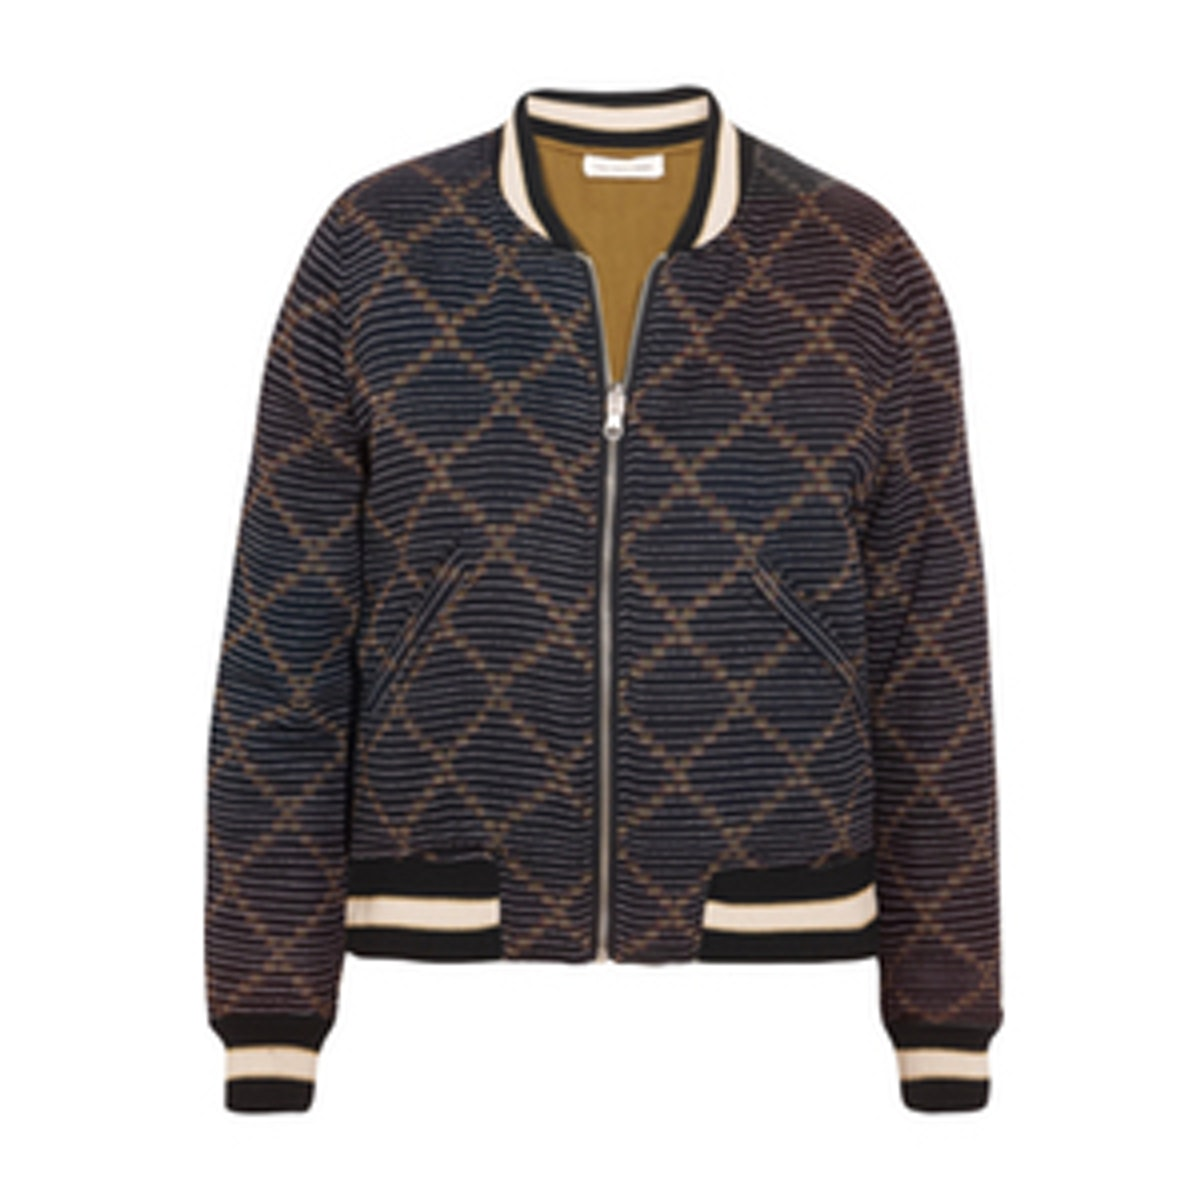 Dabney Reversible Printed Cotton Bomber Jacket